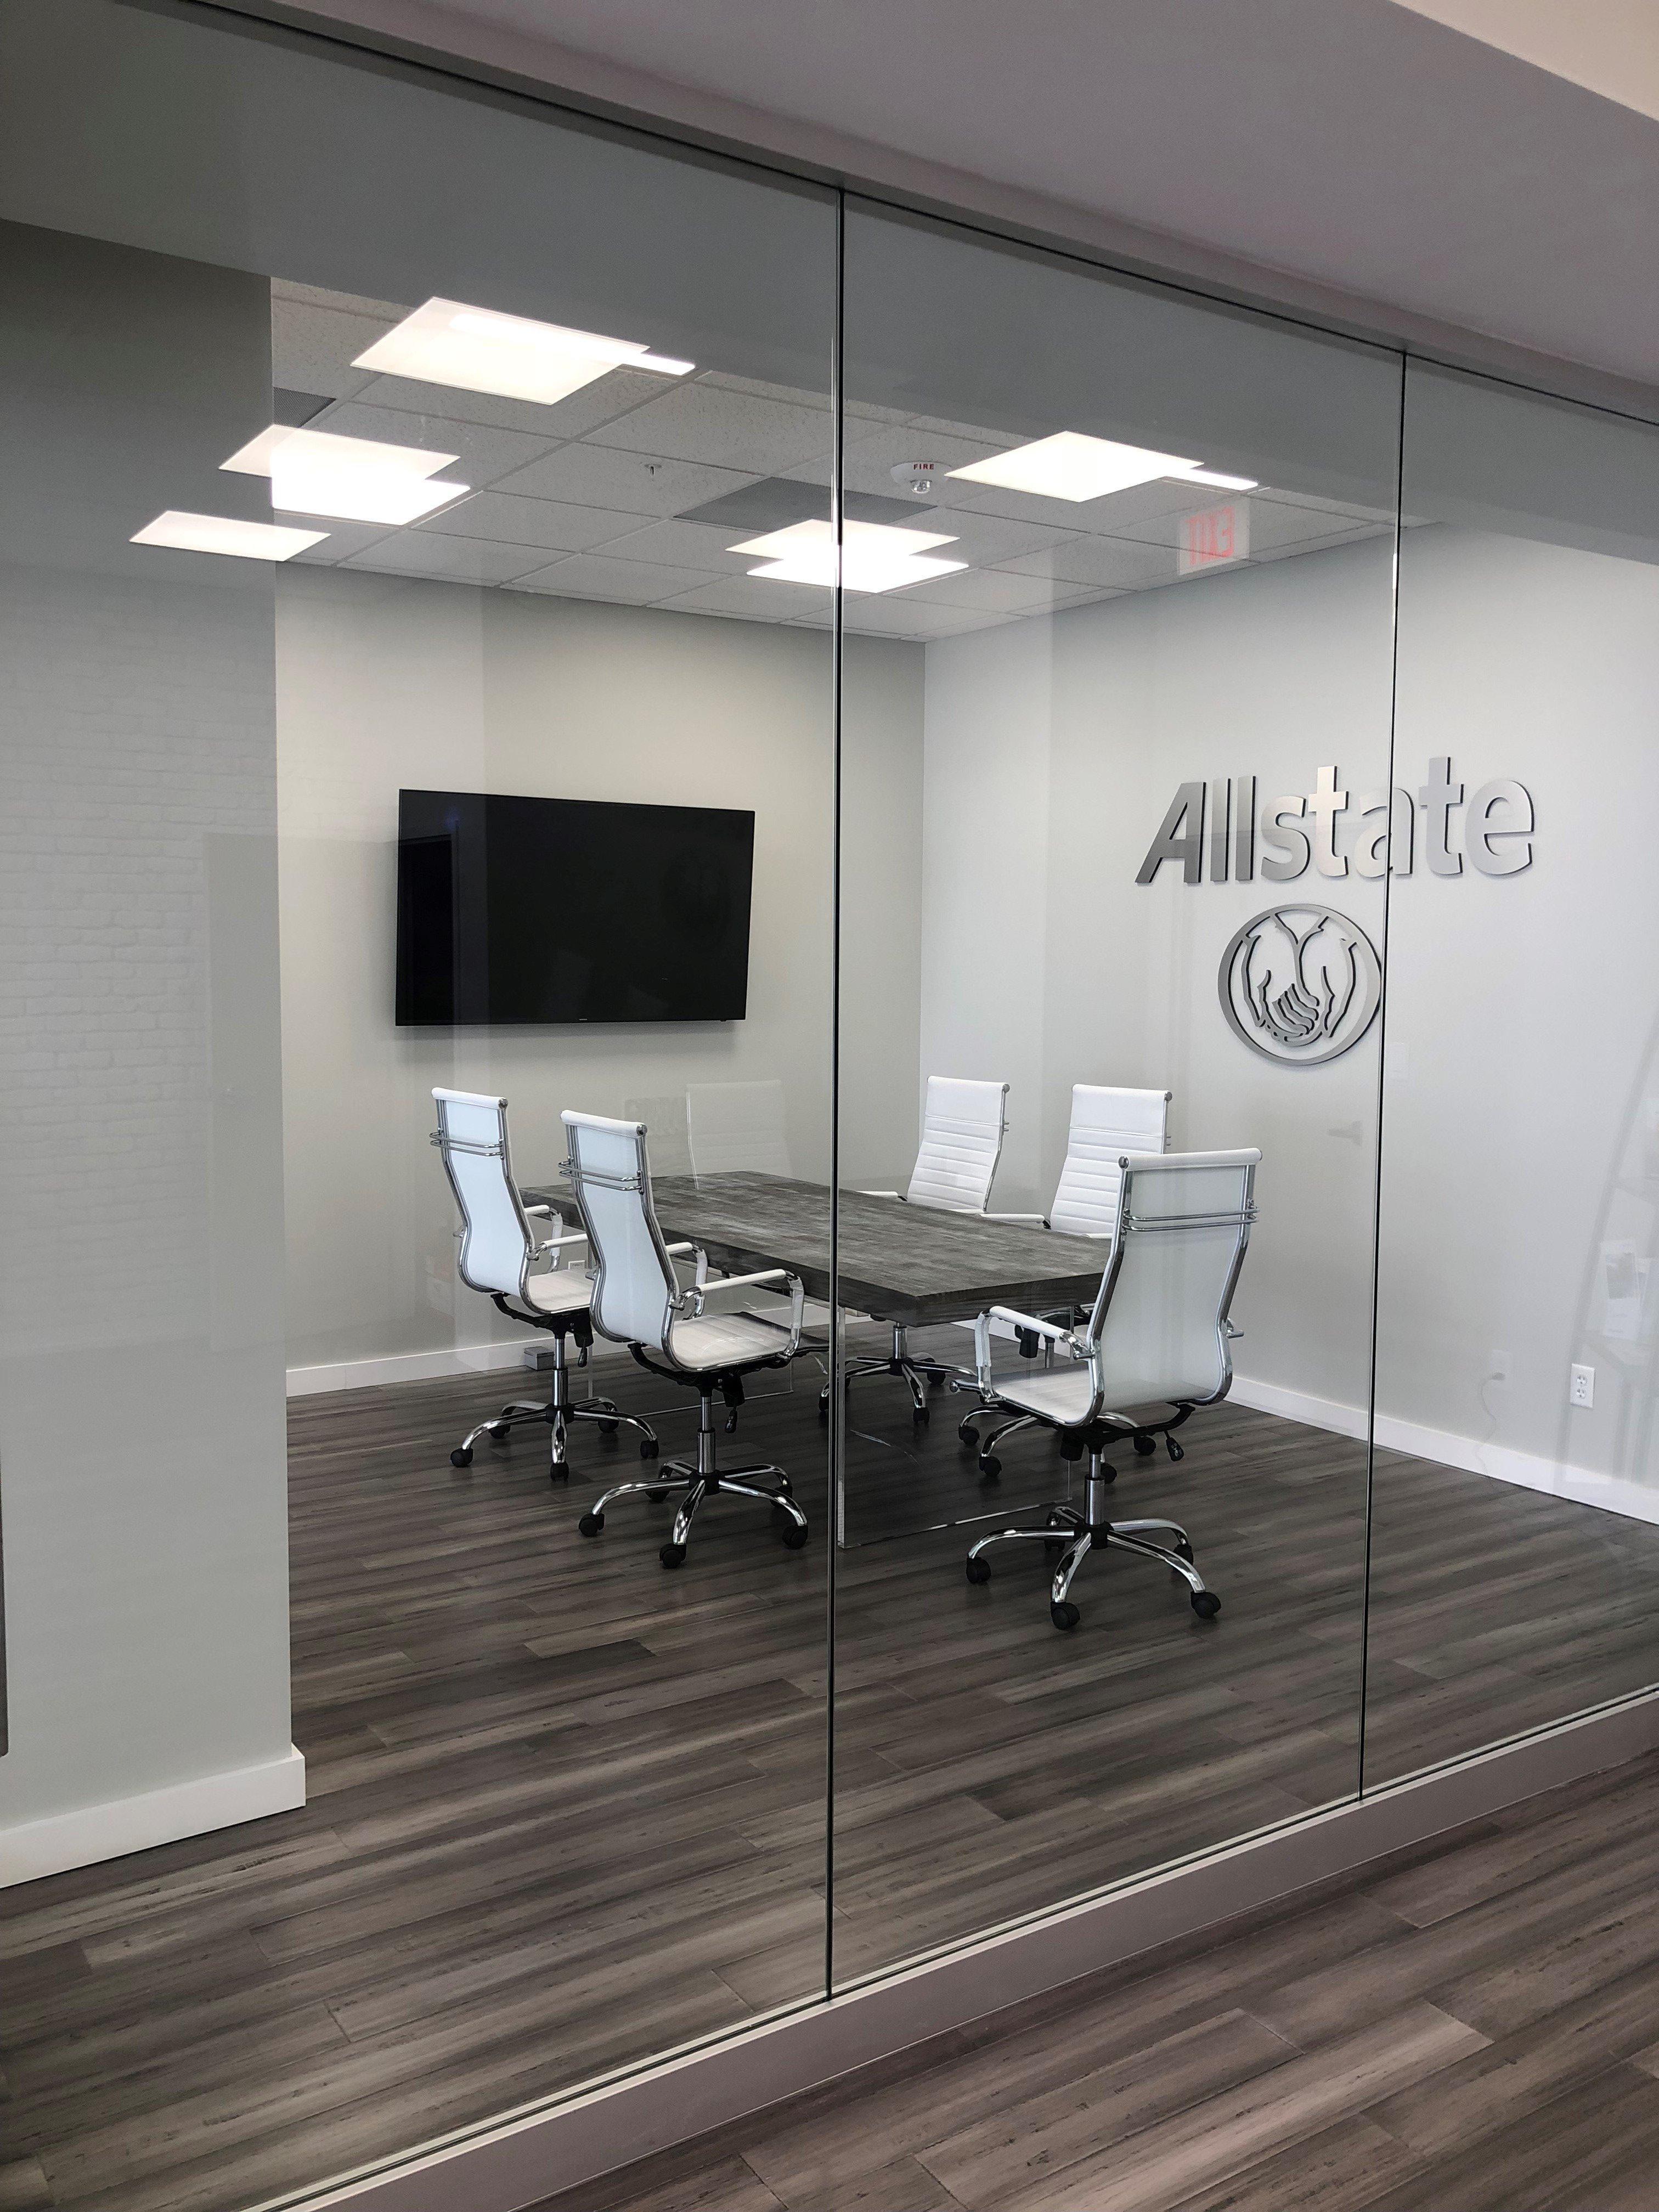 Lois Woods: Allstate Insurance image 2